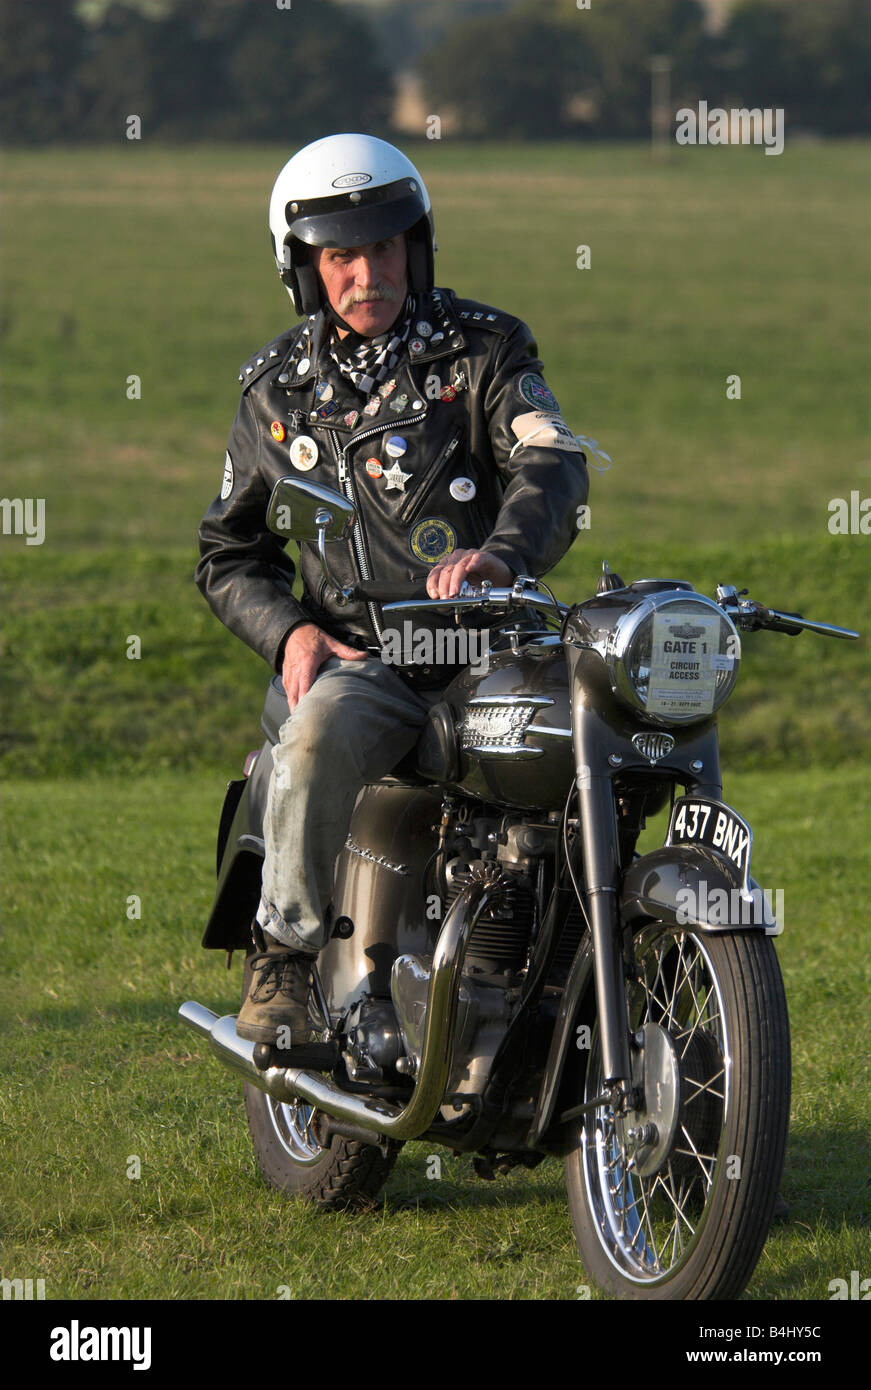 1960s Rocker On A Triumph Thunderbird Motorcycle Stock Photo